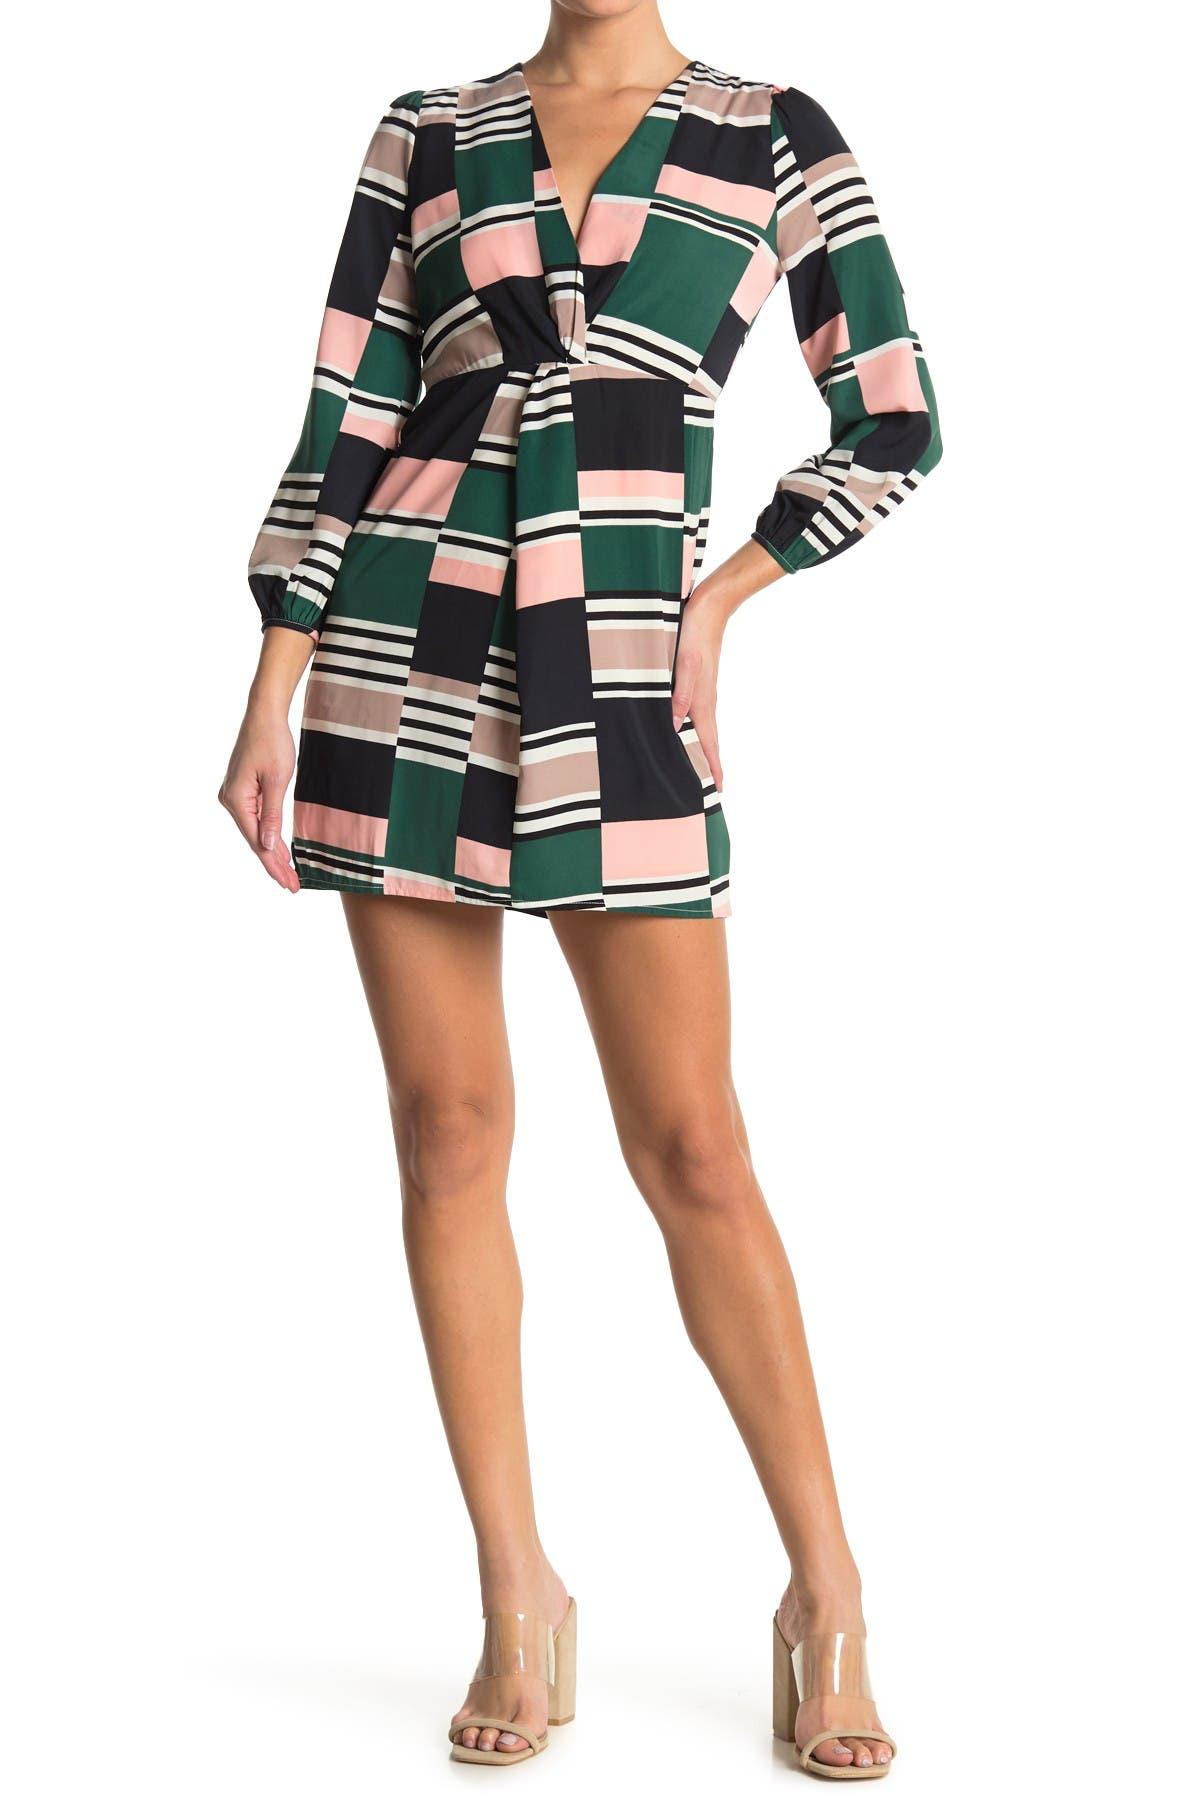 Image of LOST + WANDER Desert Springs Geo Print Mini Dress